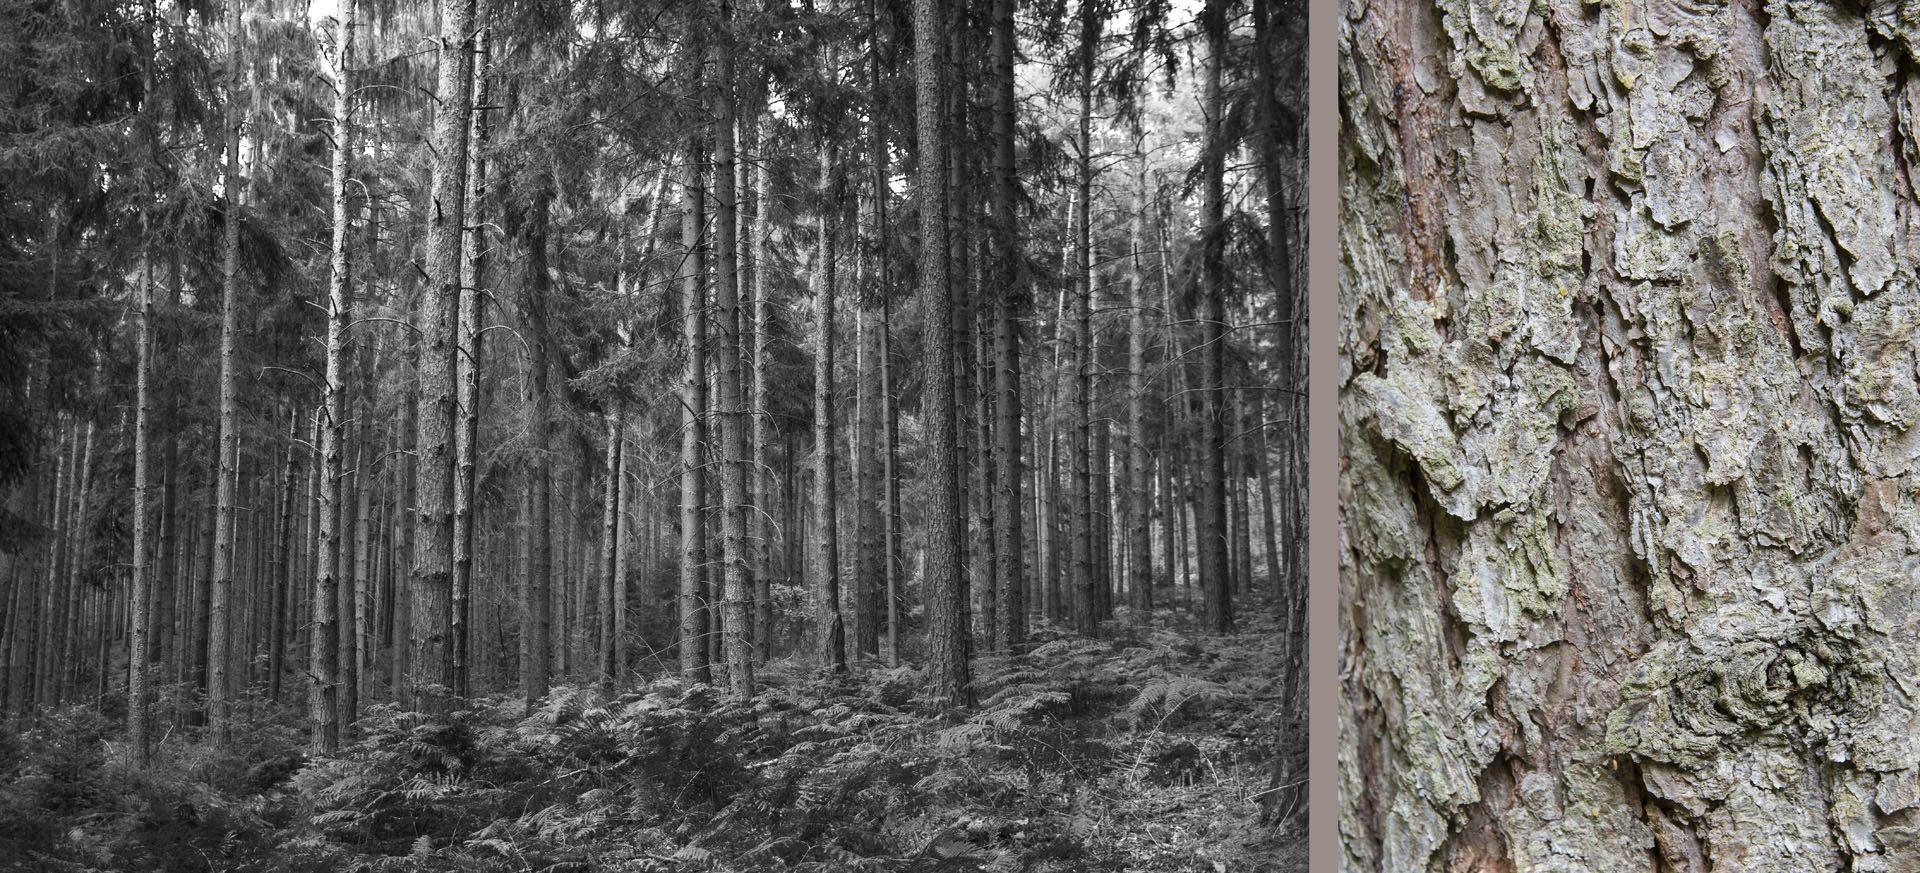 WaldRindenDoppel Tannen I • Lambda-Print auf KODAK Pro Endura, Alu-Dibond®, 110 x 50 cm, gerahmt als Art-Box • Auflage: 5 + 2 Artist's Proof